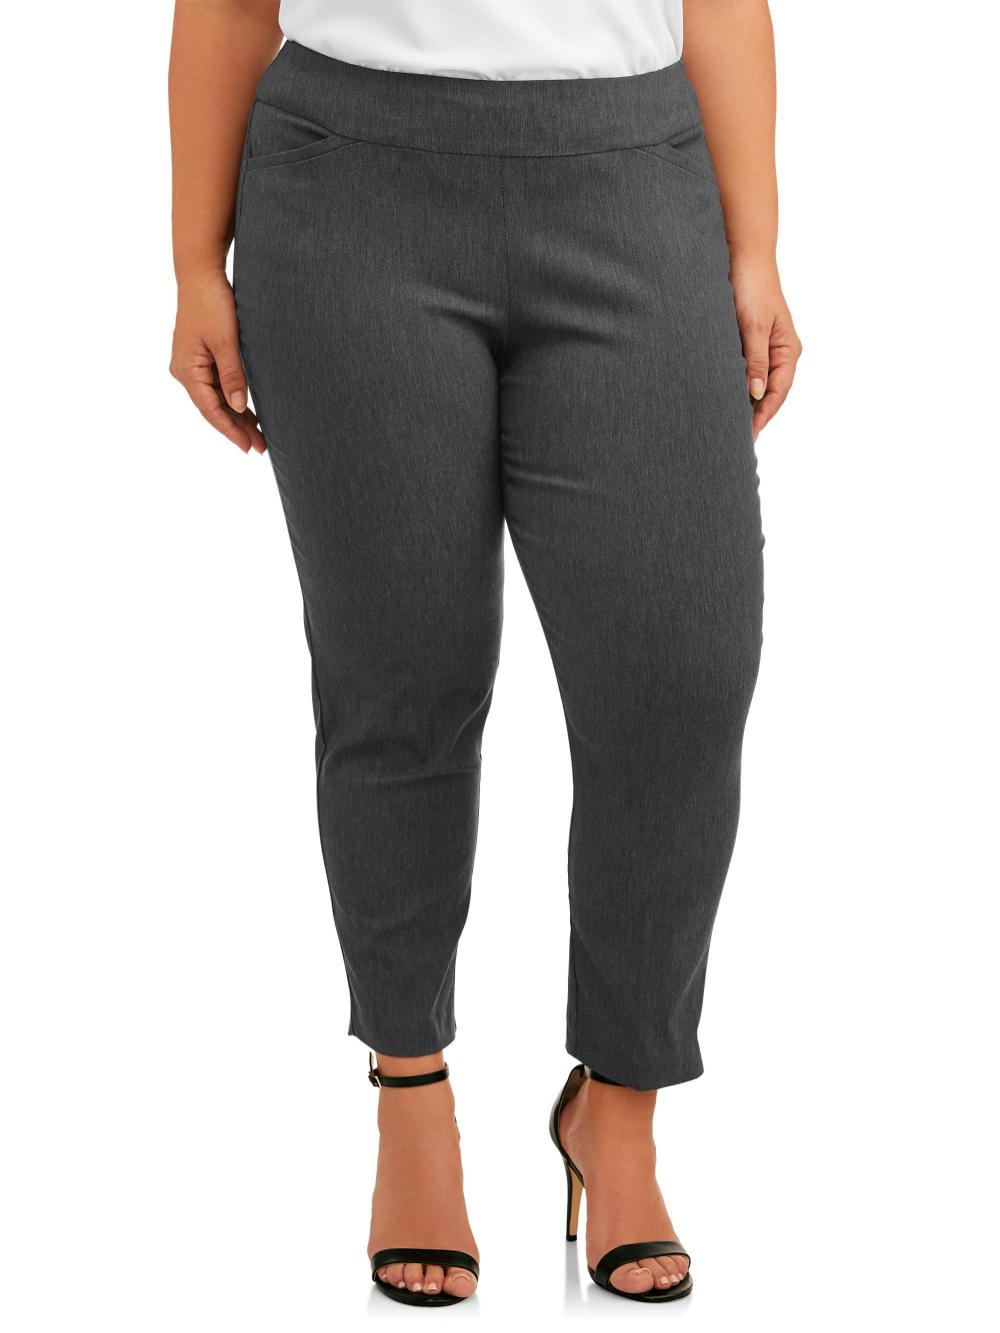 Terra Sky Terra Sky Women S Plus Size Woven Dress Pant Petite Walmart Com Dress Pant Woven Dress Stylish Pants Women [ 1333 x 1000 Pixel ]